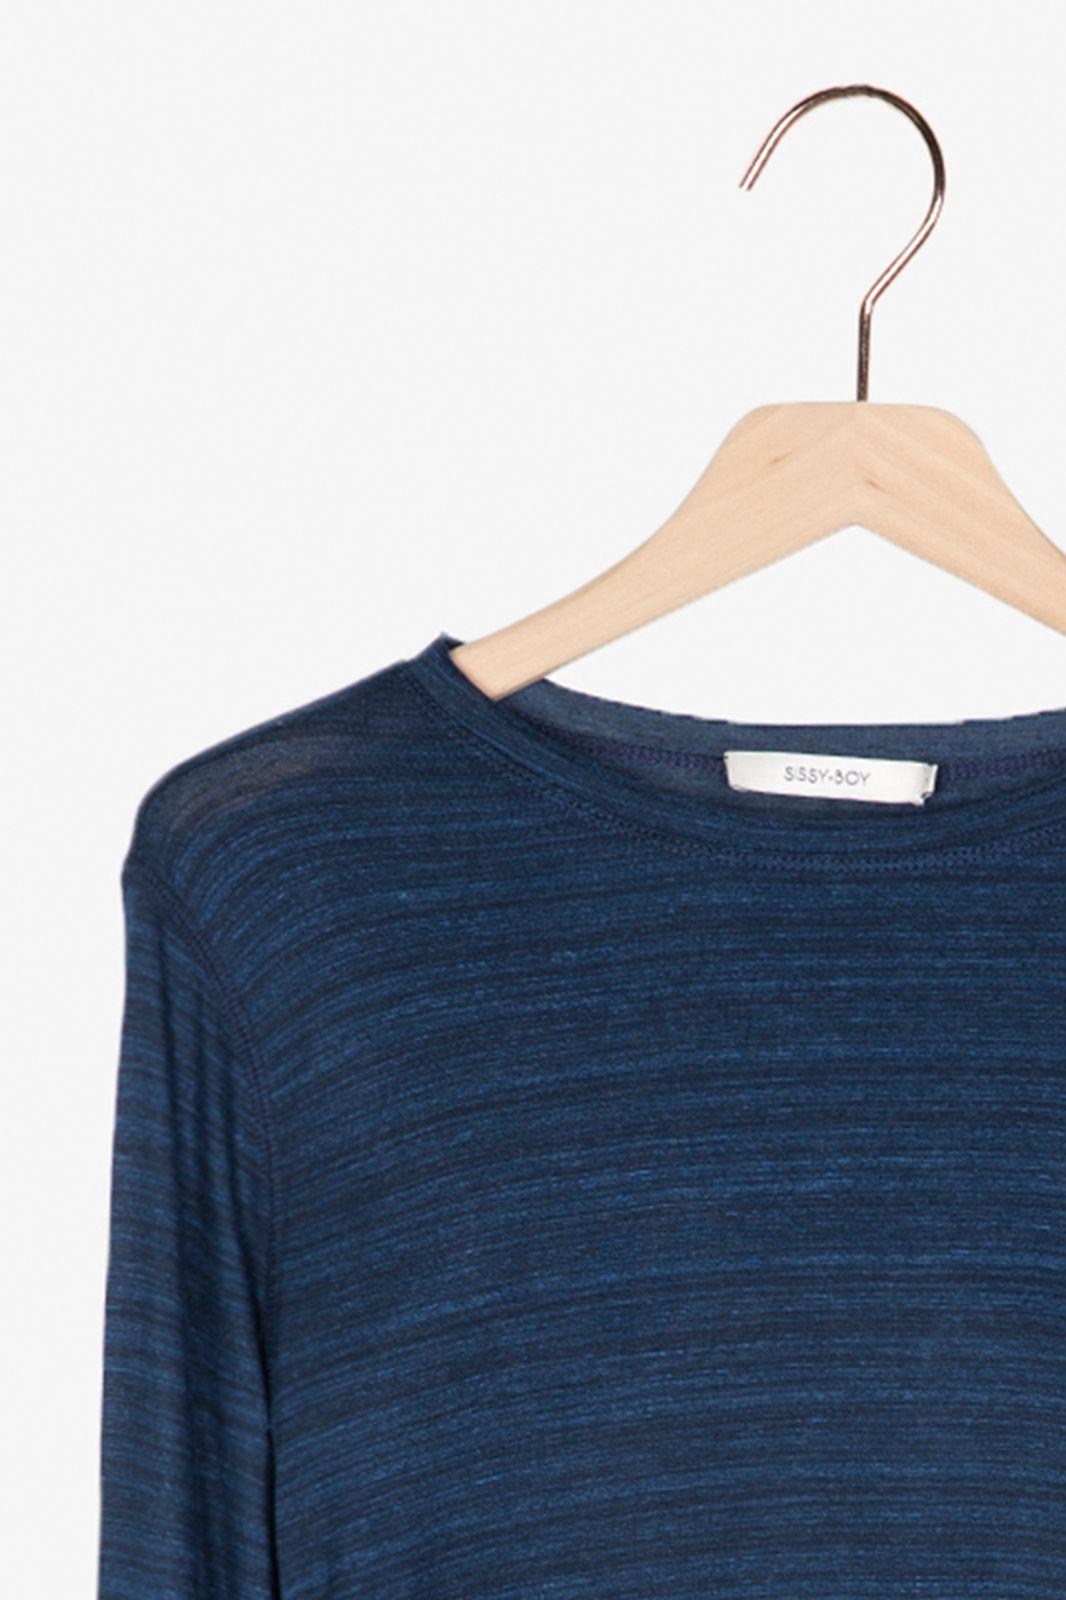 Donkerblauw t-shirt cupro